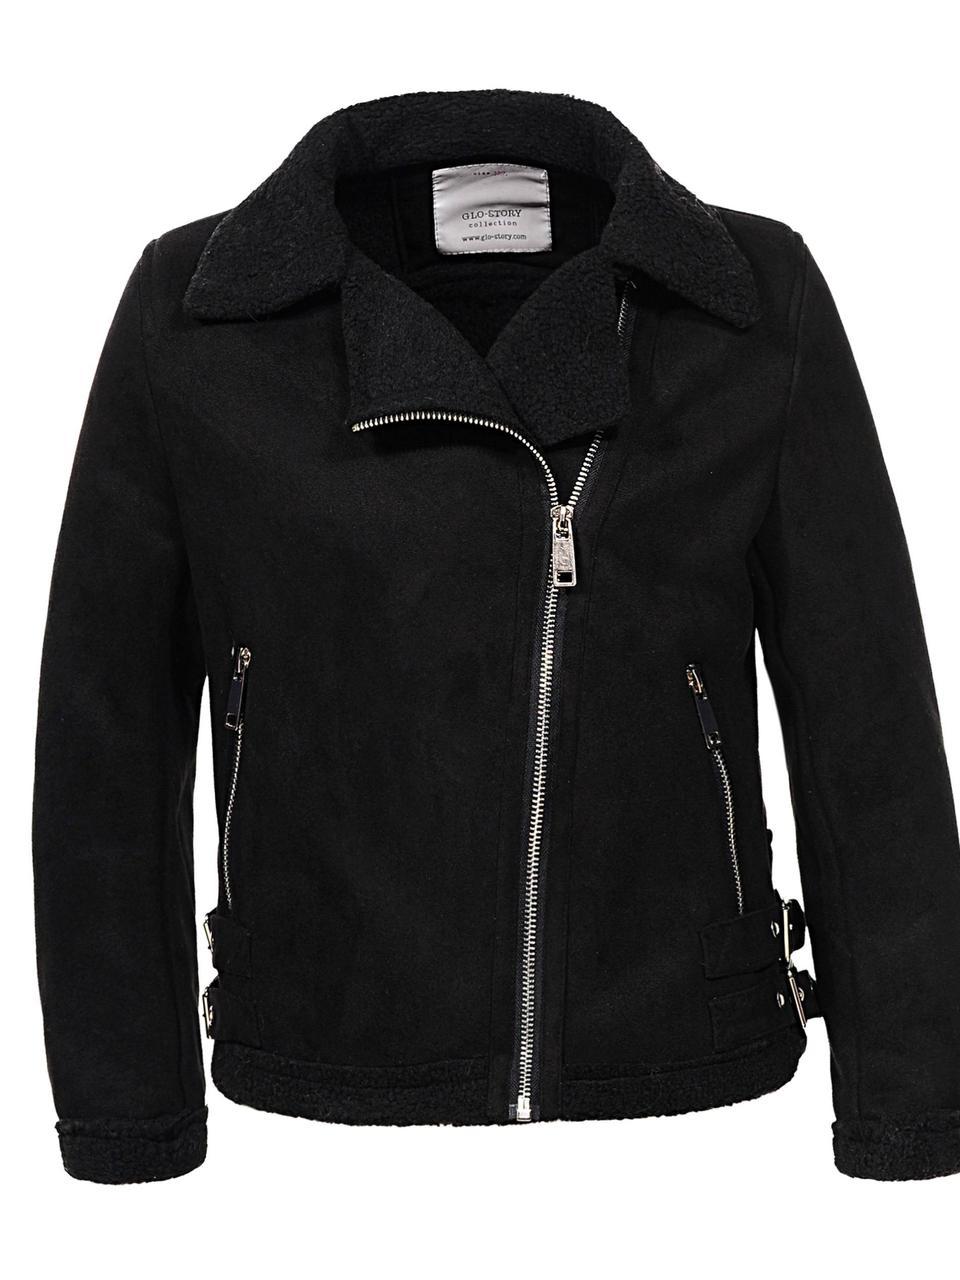 Куртки(дублёнки) для девочек на меху оптом, размеры 110-160 Glo-story, арт. GPY-6795